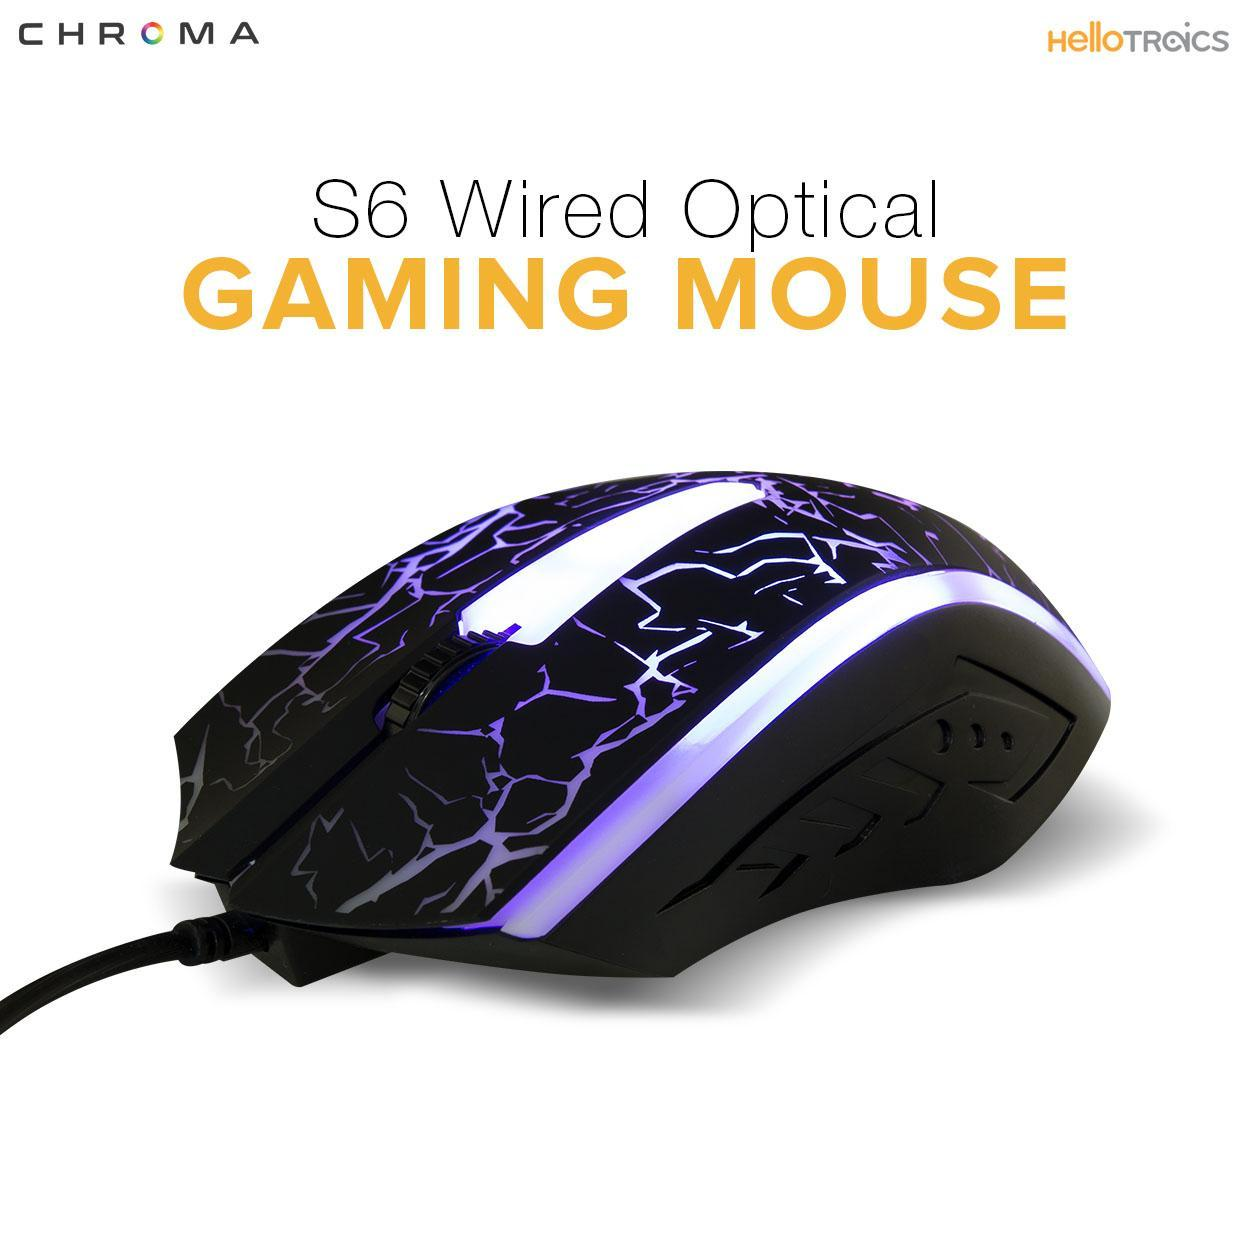 Sundy Mall Razer Naga Epic Chroma Wired Wireless Mmo Gaming S6 Optical Mouse Black